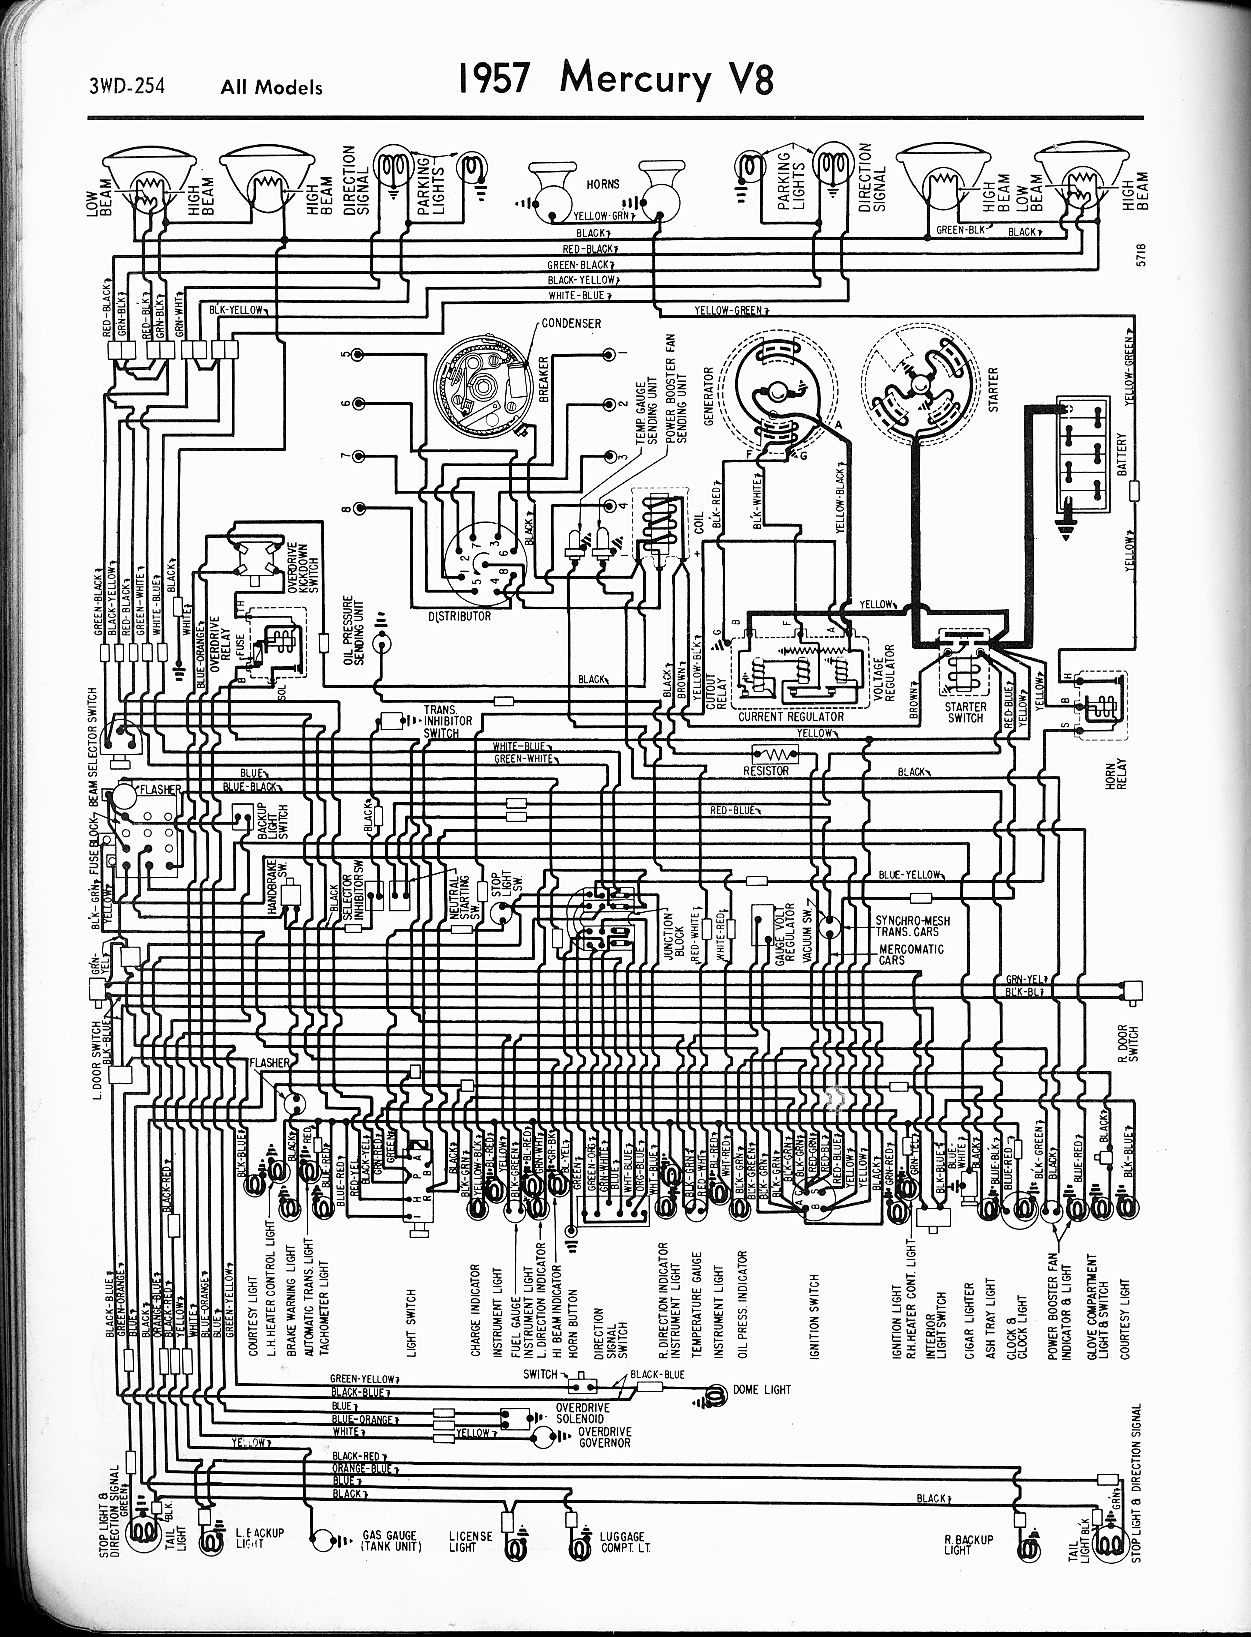 nh_0193] 1956 mercury wiring diagram download diagram  eumqu embo vish ungo sapebe mohammedshrine librar wiring 101